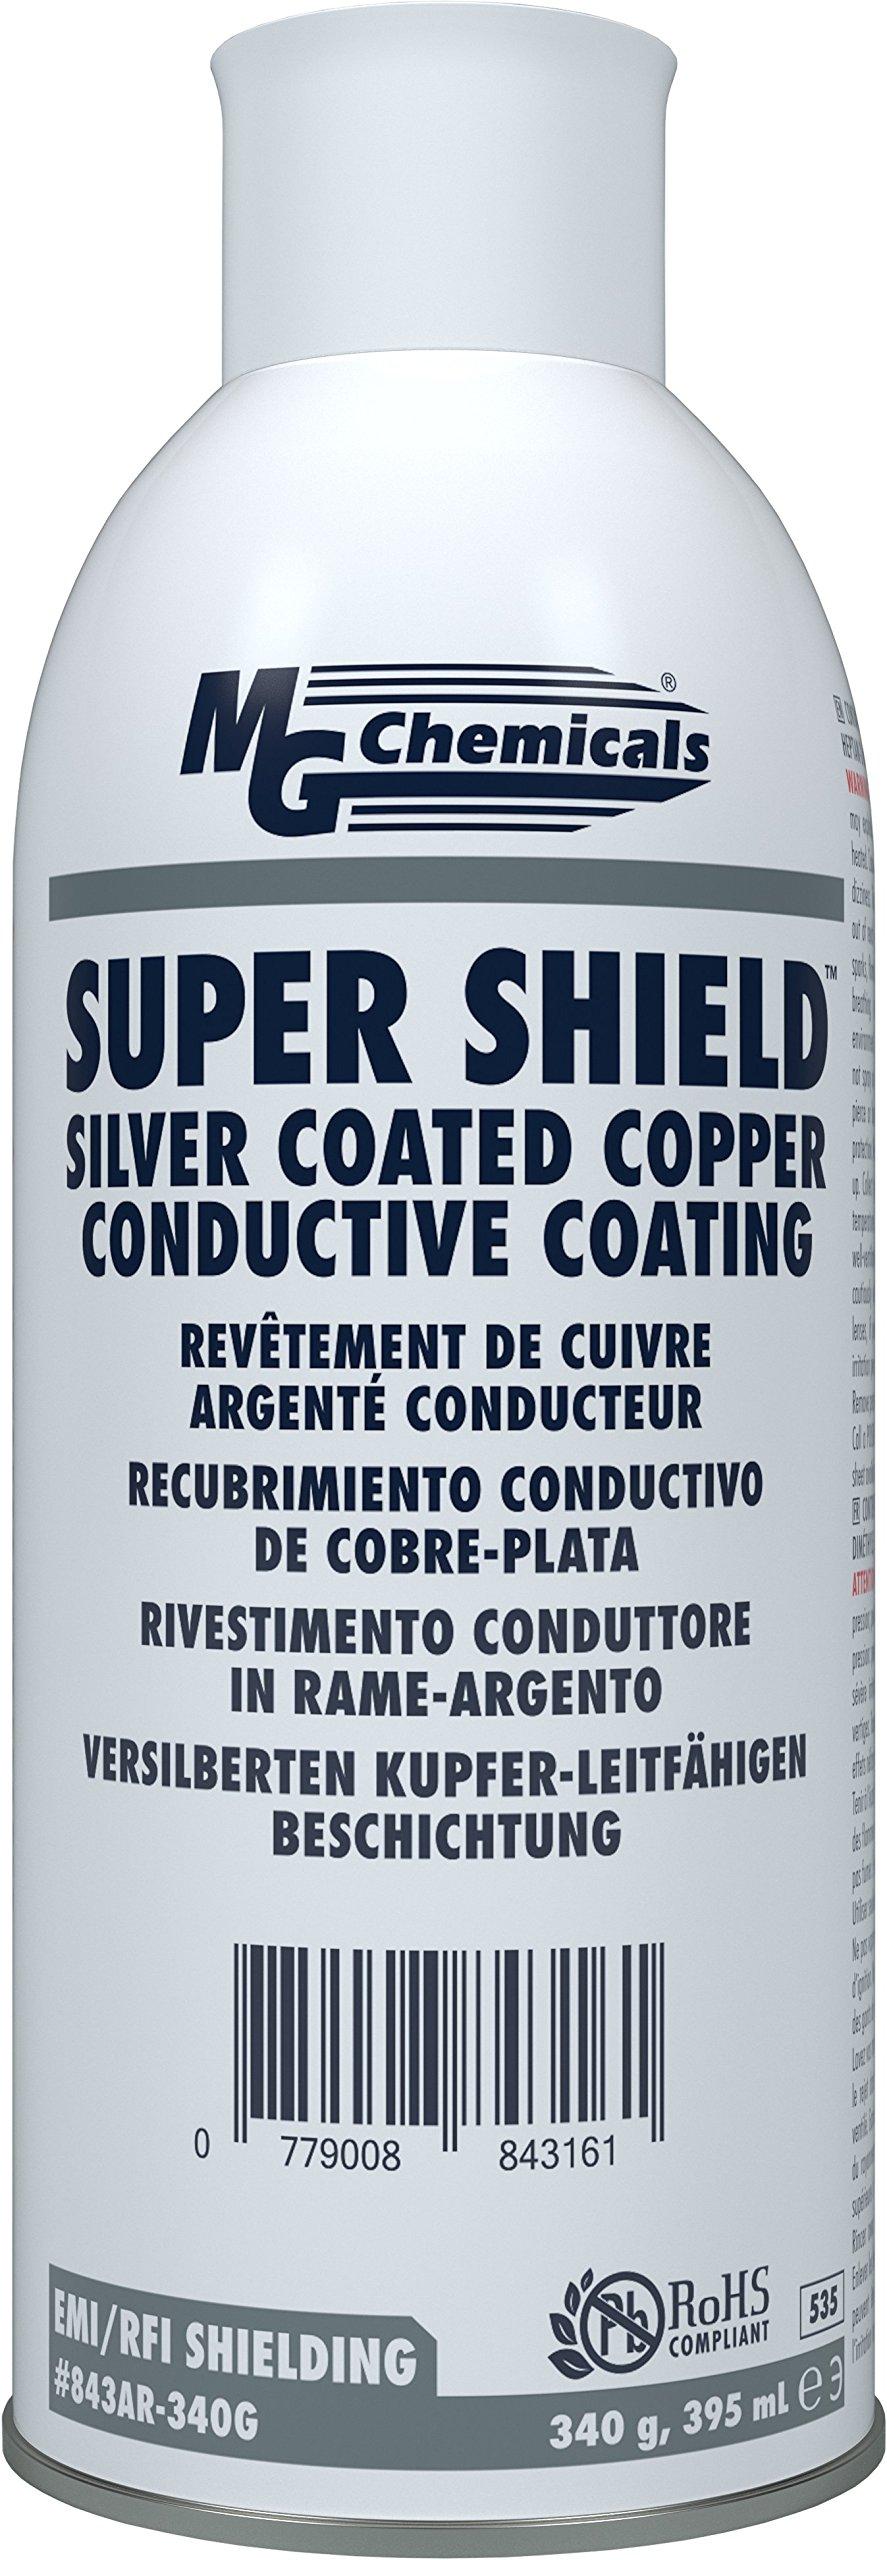 MG Chemicals Super Shield Silver Coated Copper Conductive Coating, 12 oz, Aerosol Can